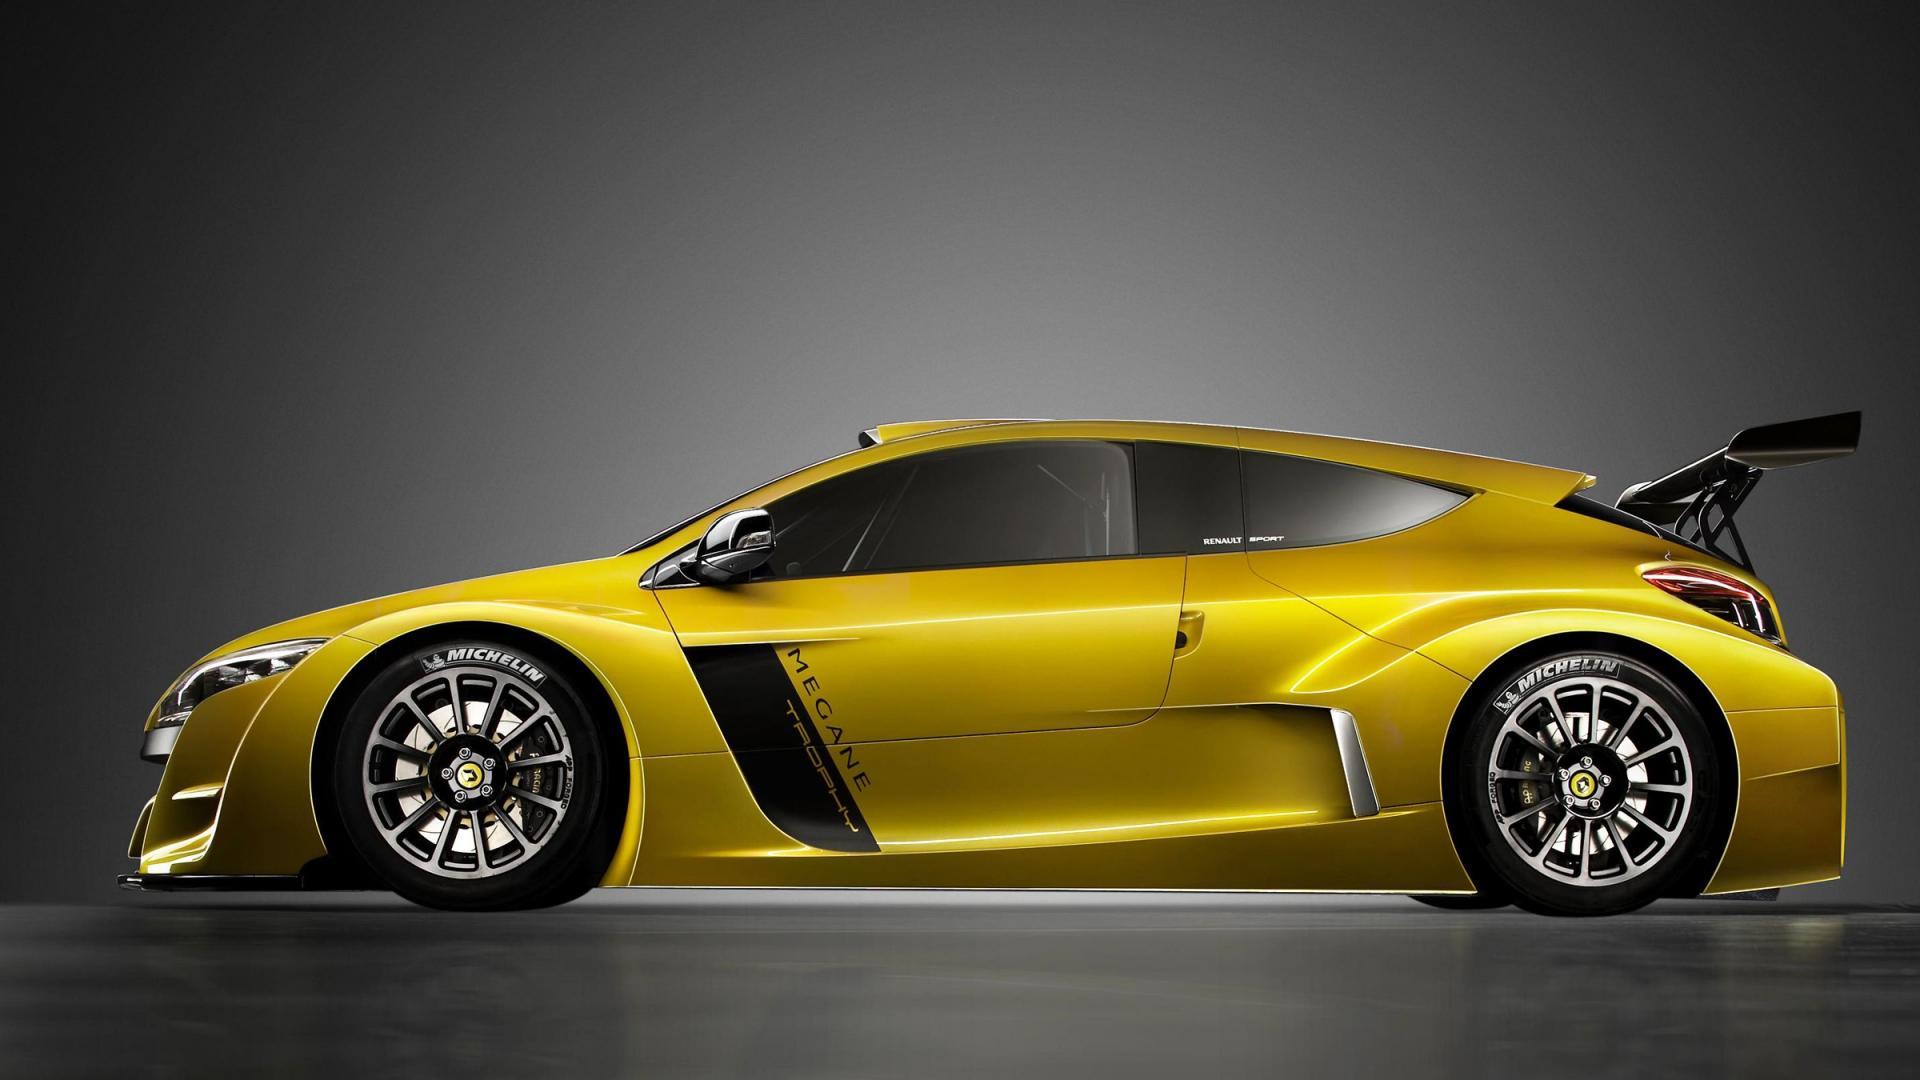 Jaguar Car Live Wallpaper Download Awesome Yellow Car Hd Wallpaper 2013 My Site